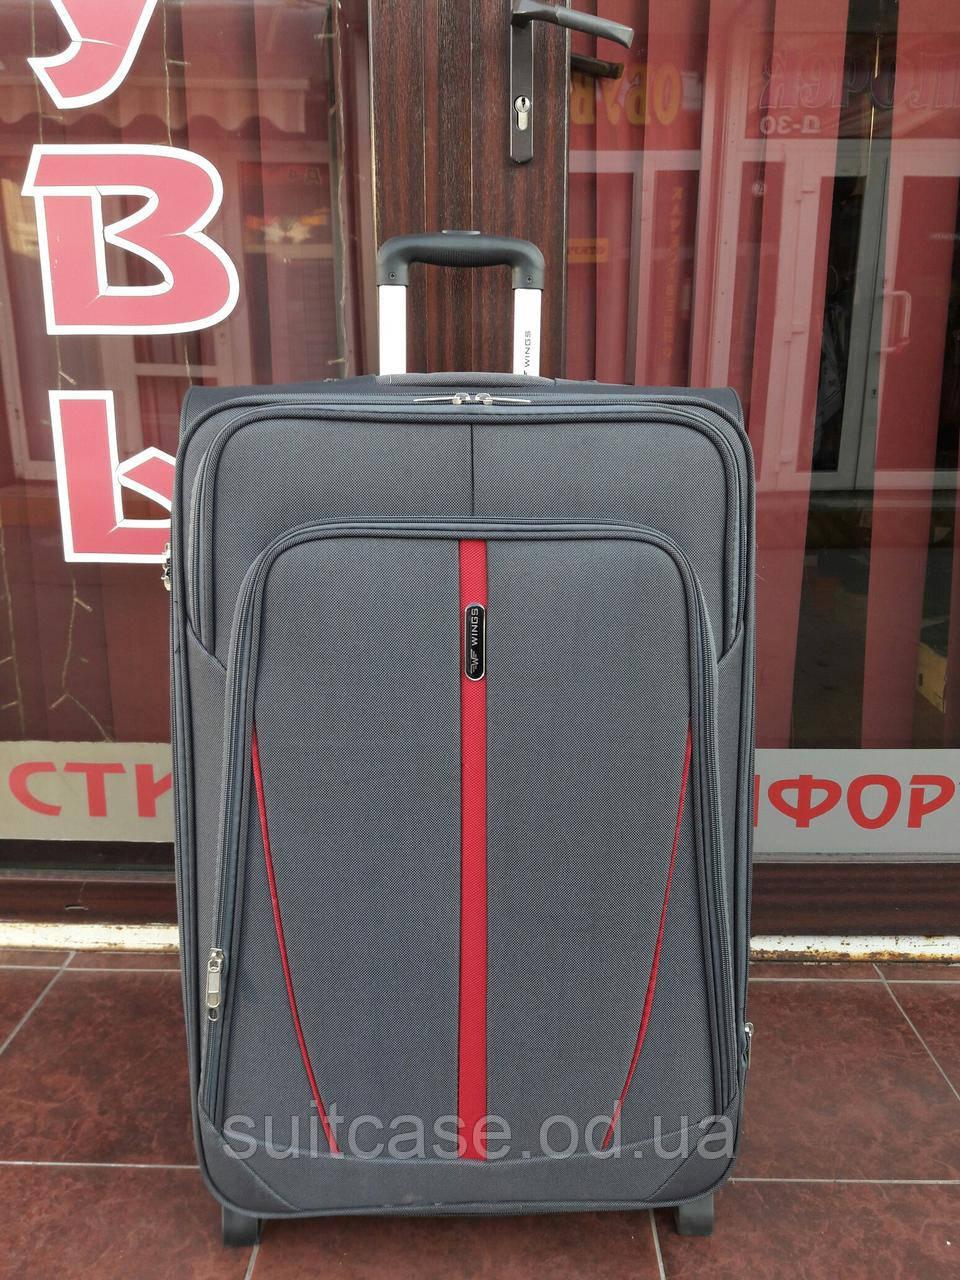 Чемодан дорожный тканевый большой Wings 1706 , на 2-х колесах -  Интернет-магазин a6e063a5096